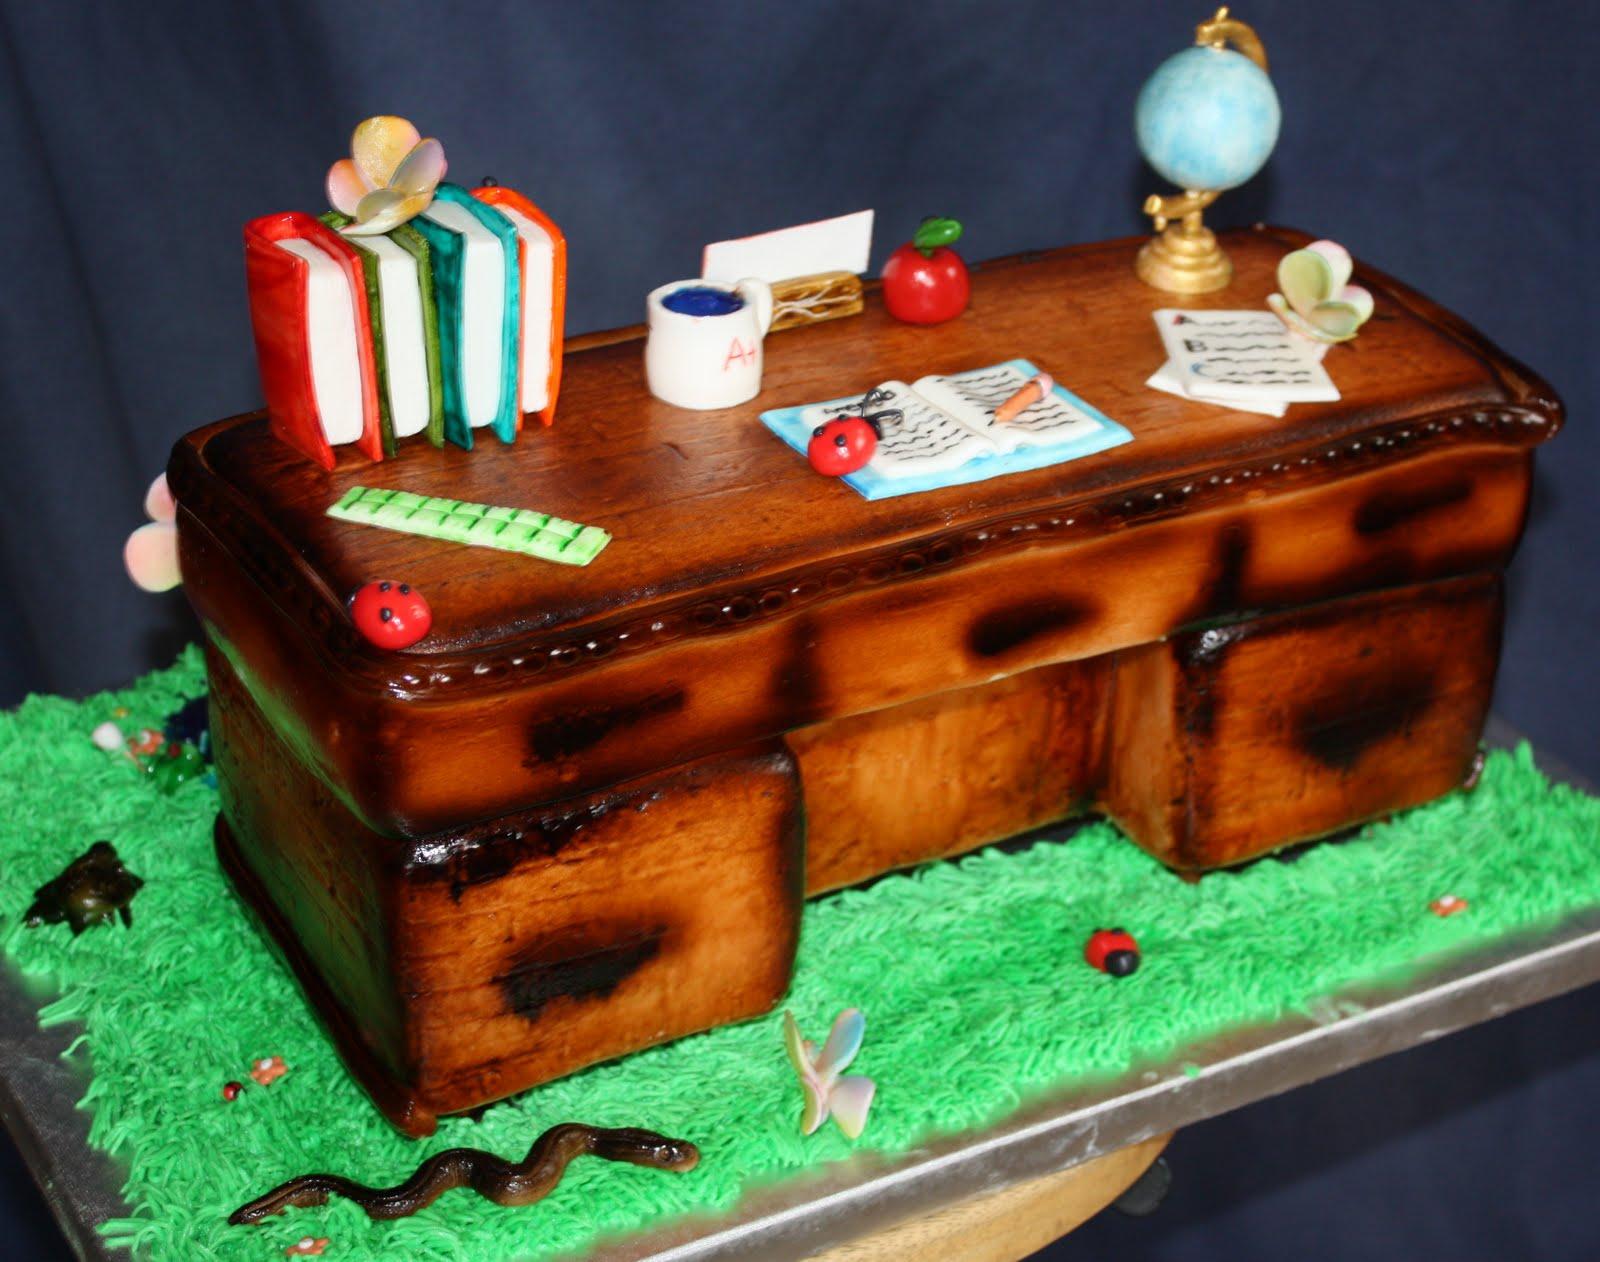 The Cake Mama Teacher Retirement Desk cake